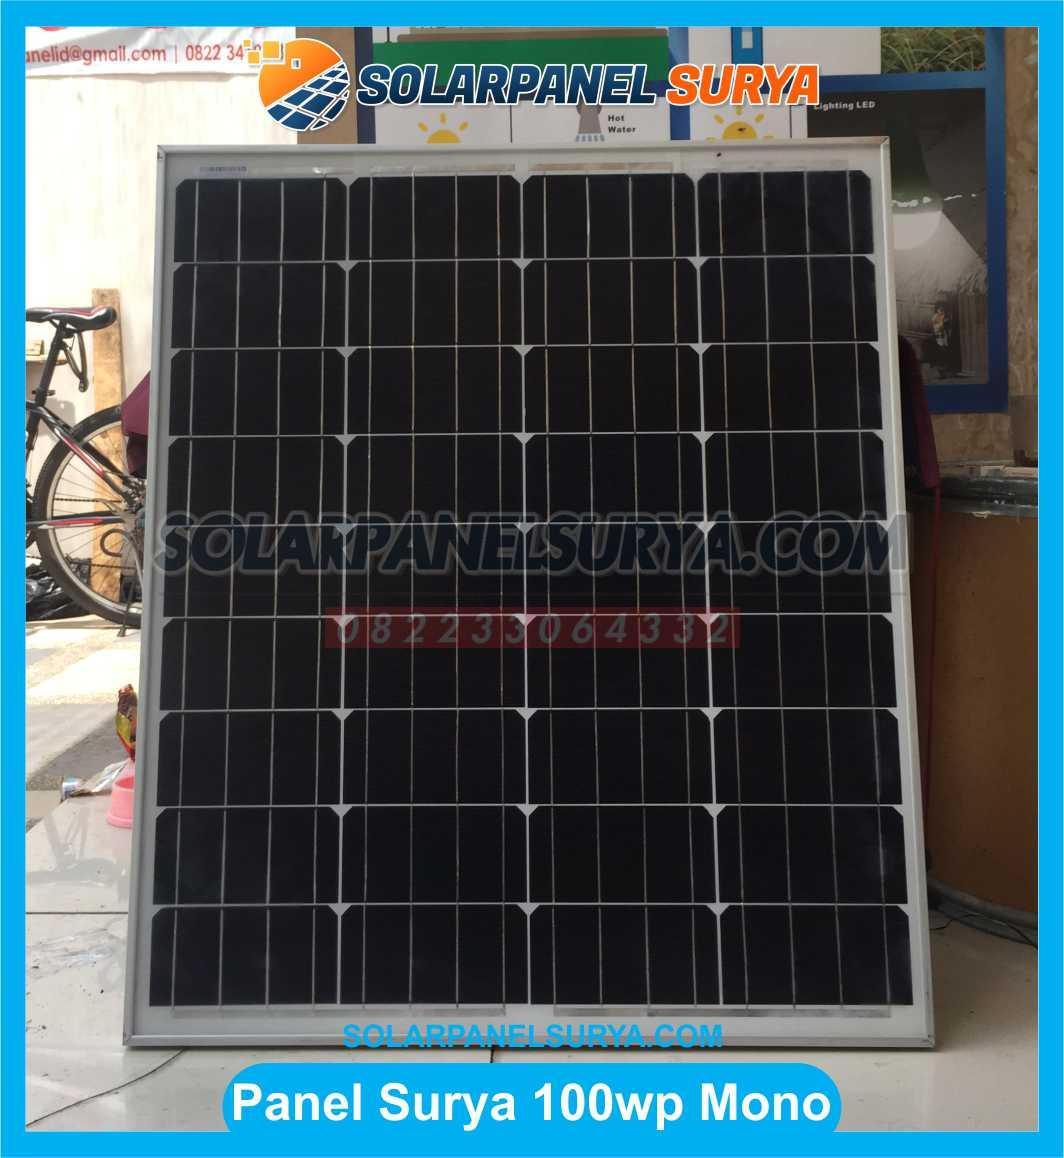 Jual Solar Panel 100 WP Monocrystalline